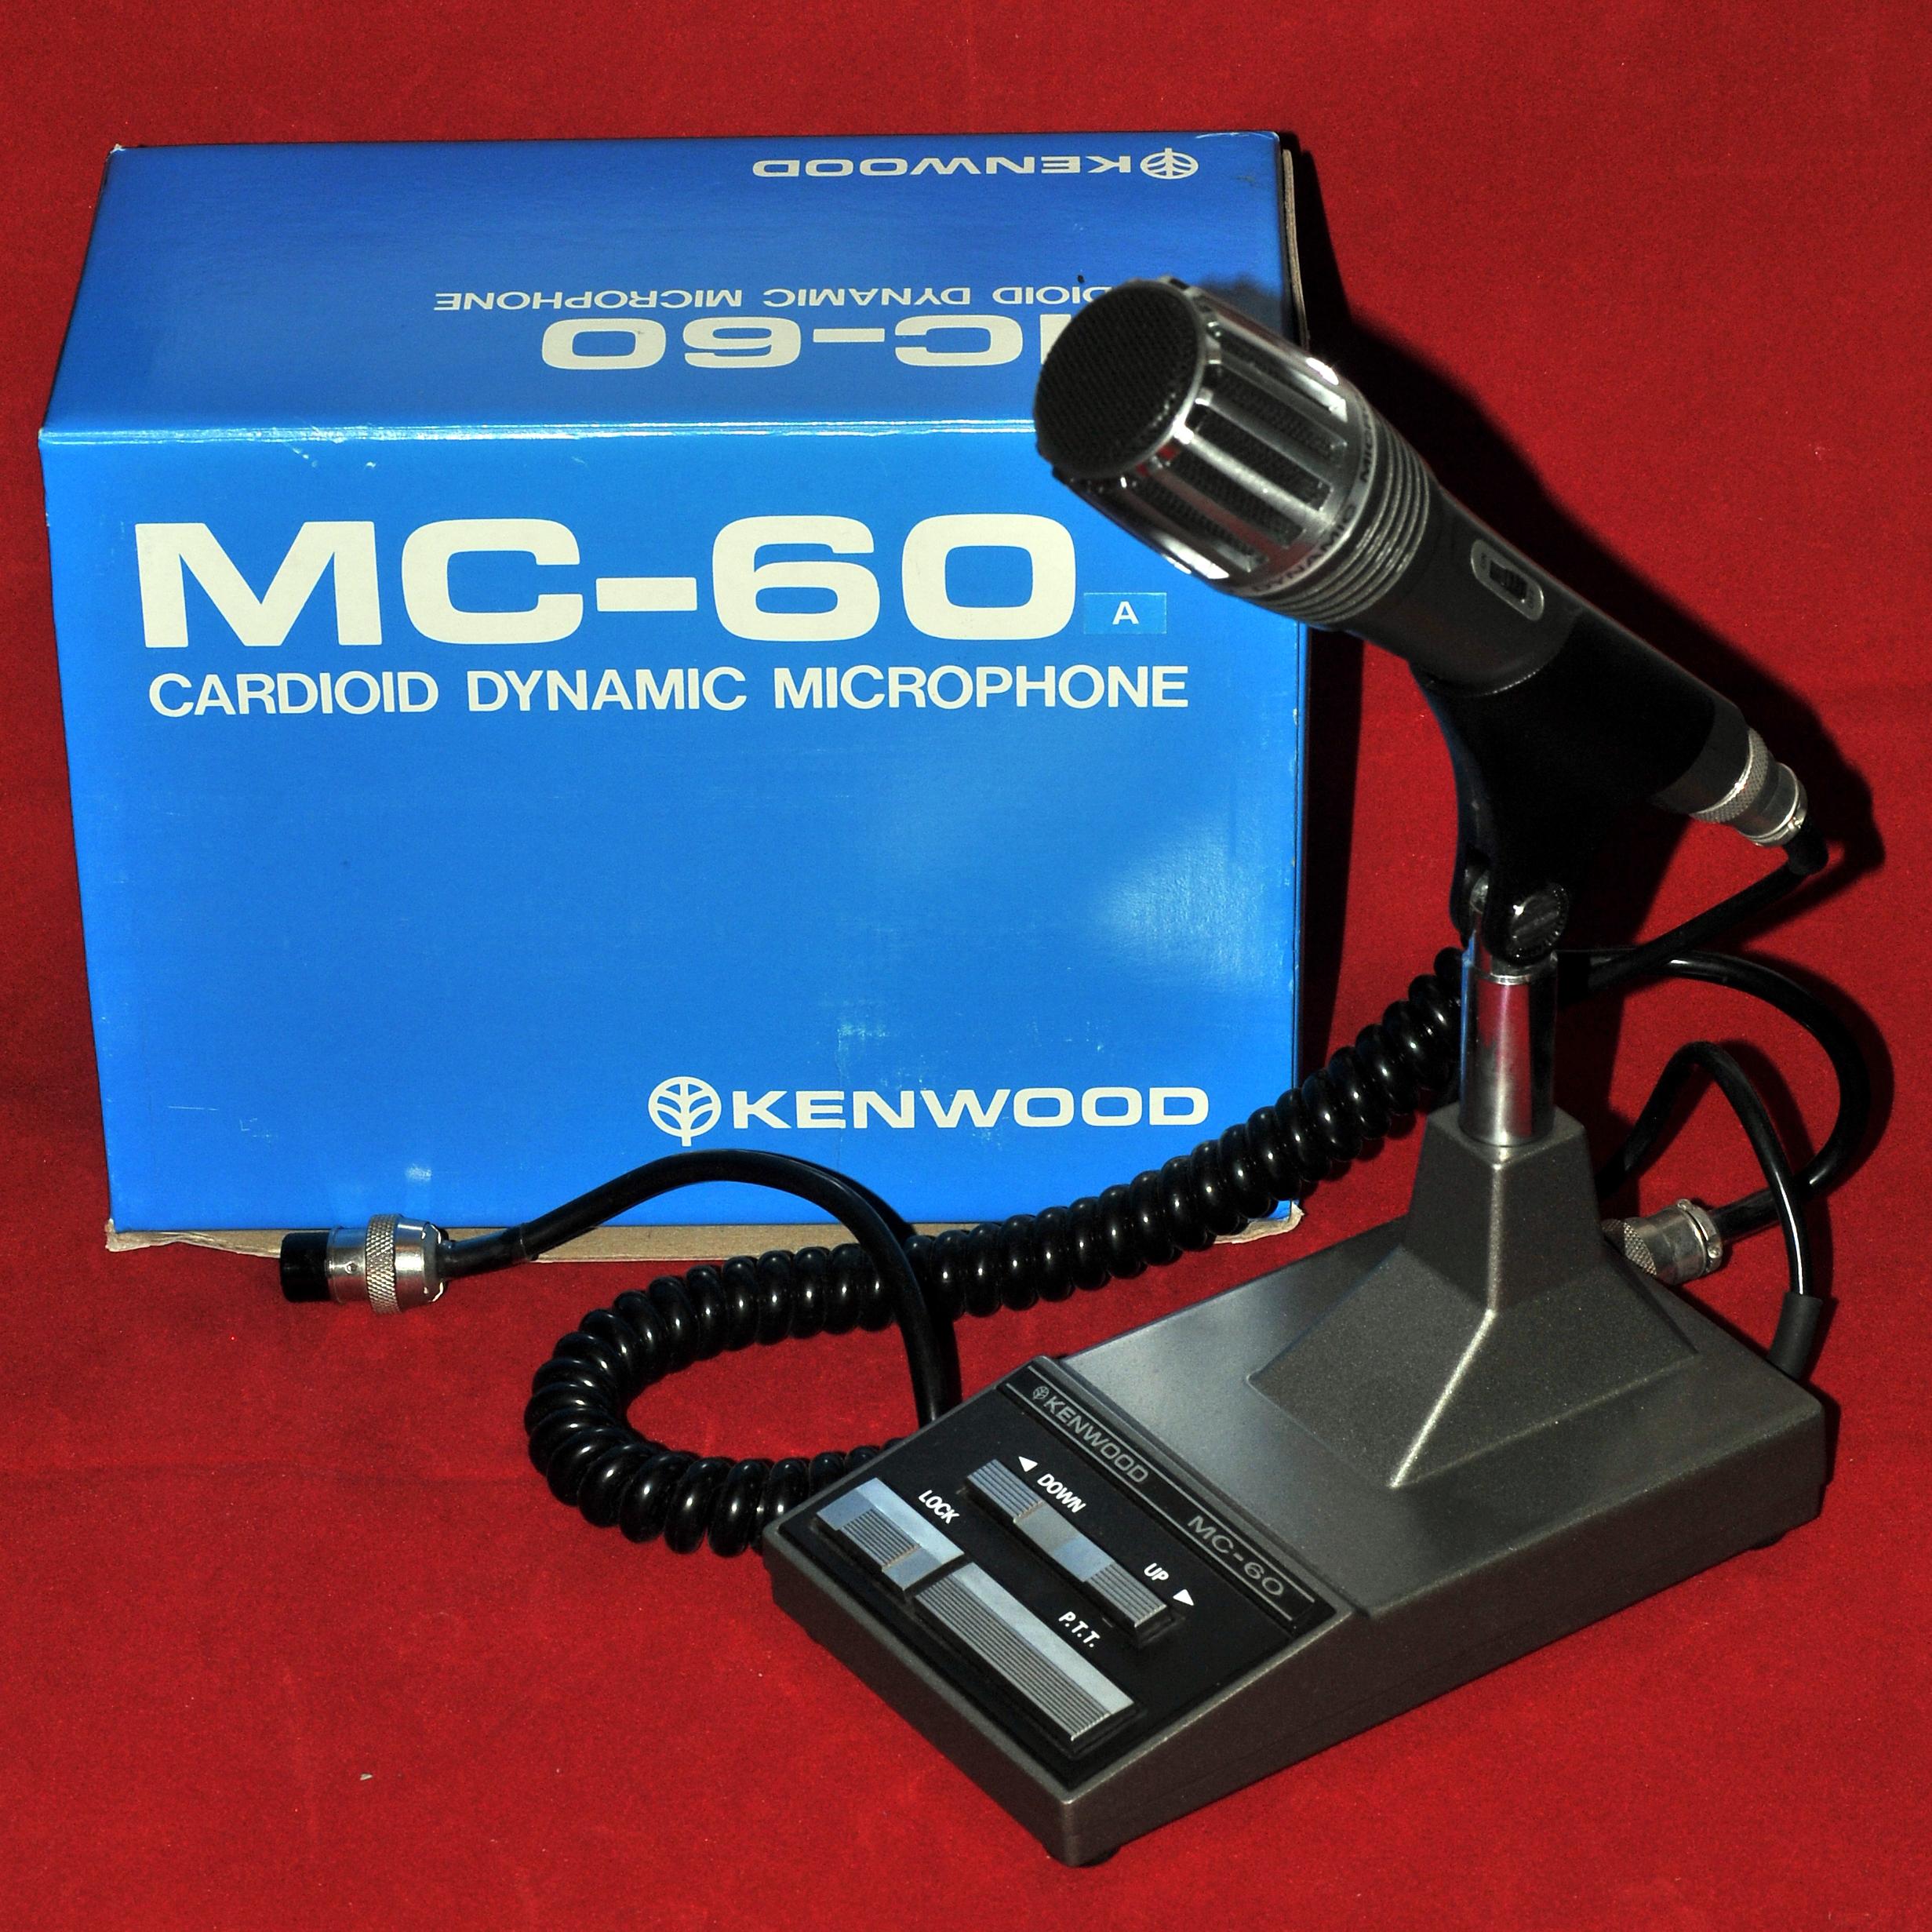 Kenwood Kmc 35 Mic Wiring Diagram Quick Start Guide Of Dynamic Mc 60 Diagrams Circuit Maker Microphone Tk 840